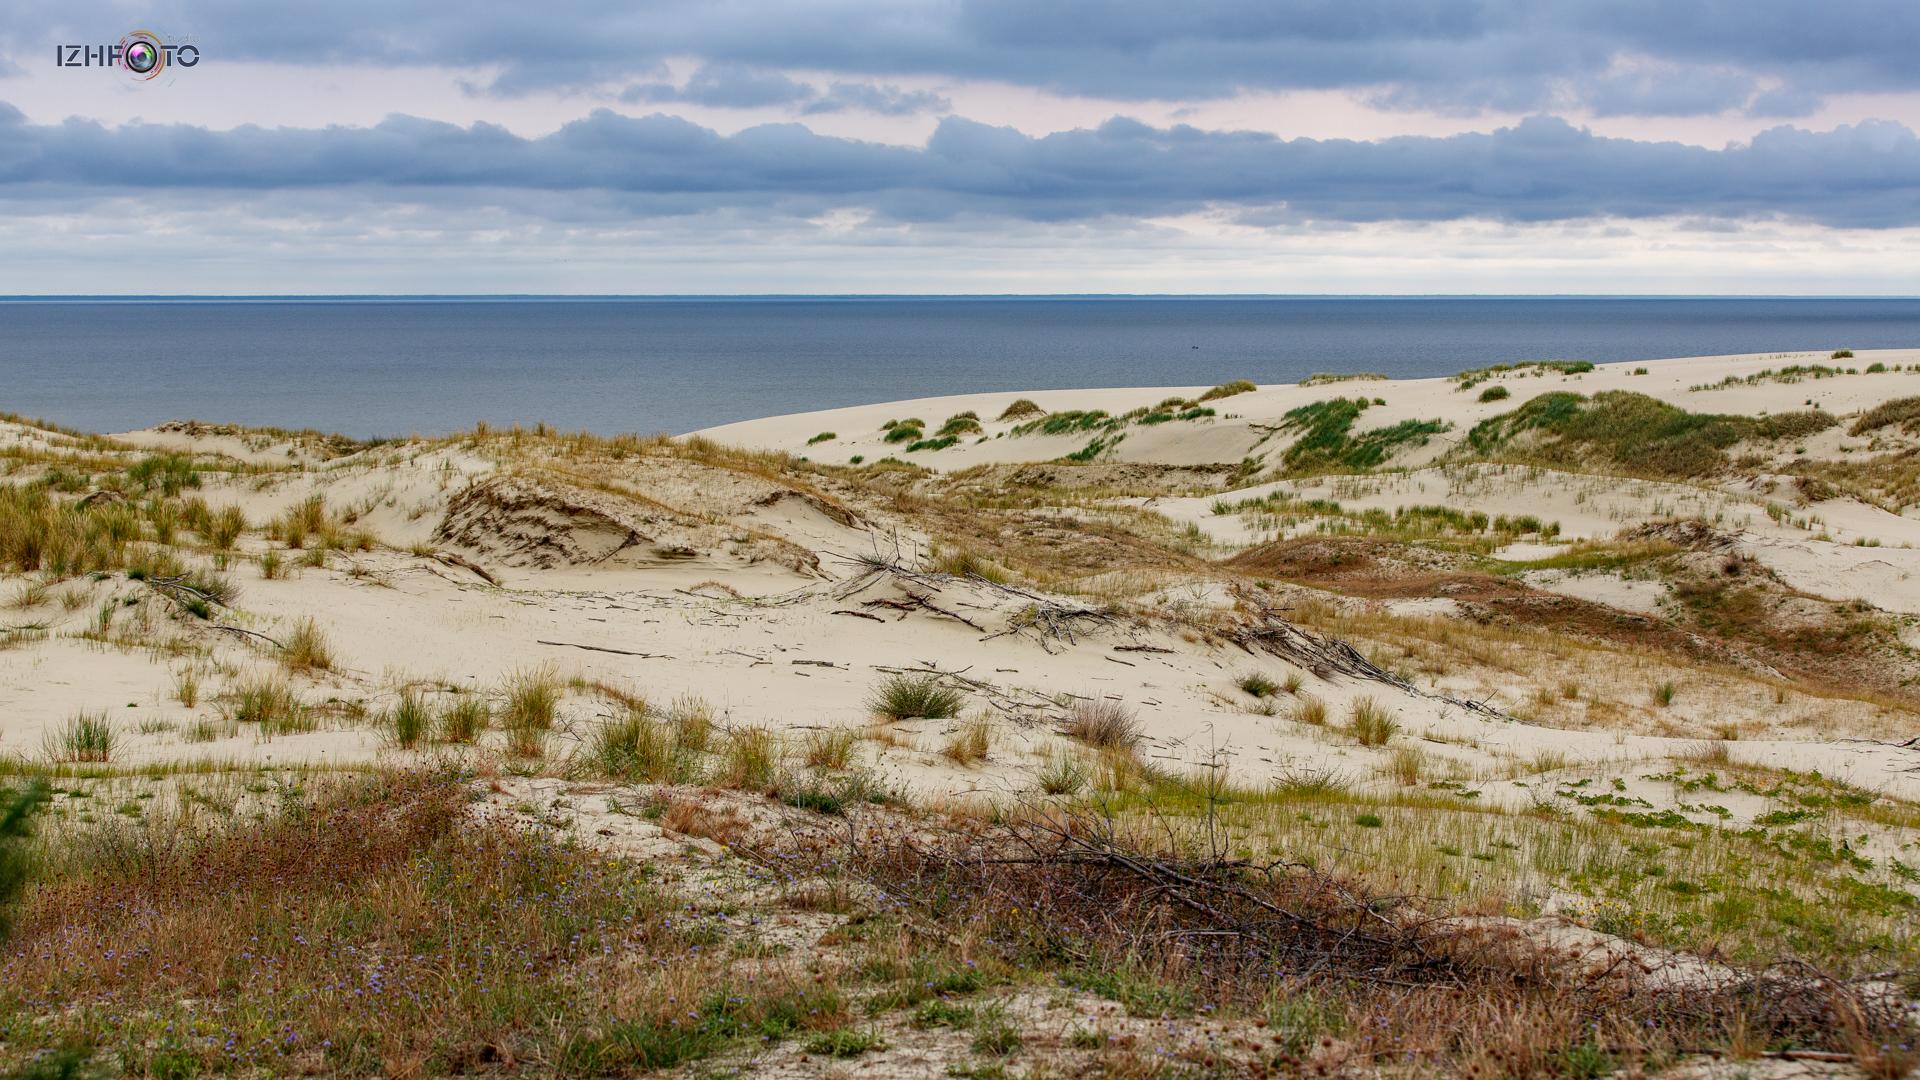 Фото песчаных дюн у Куршского залива Калининградская область